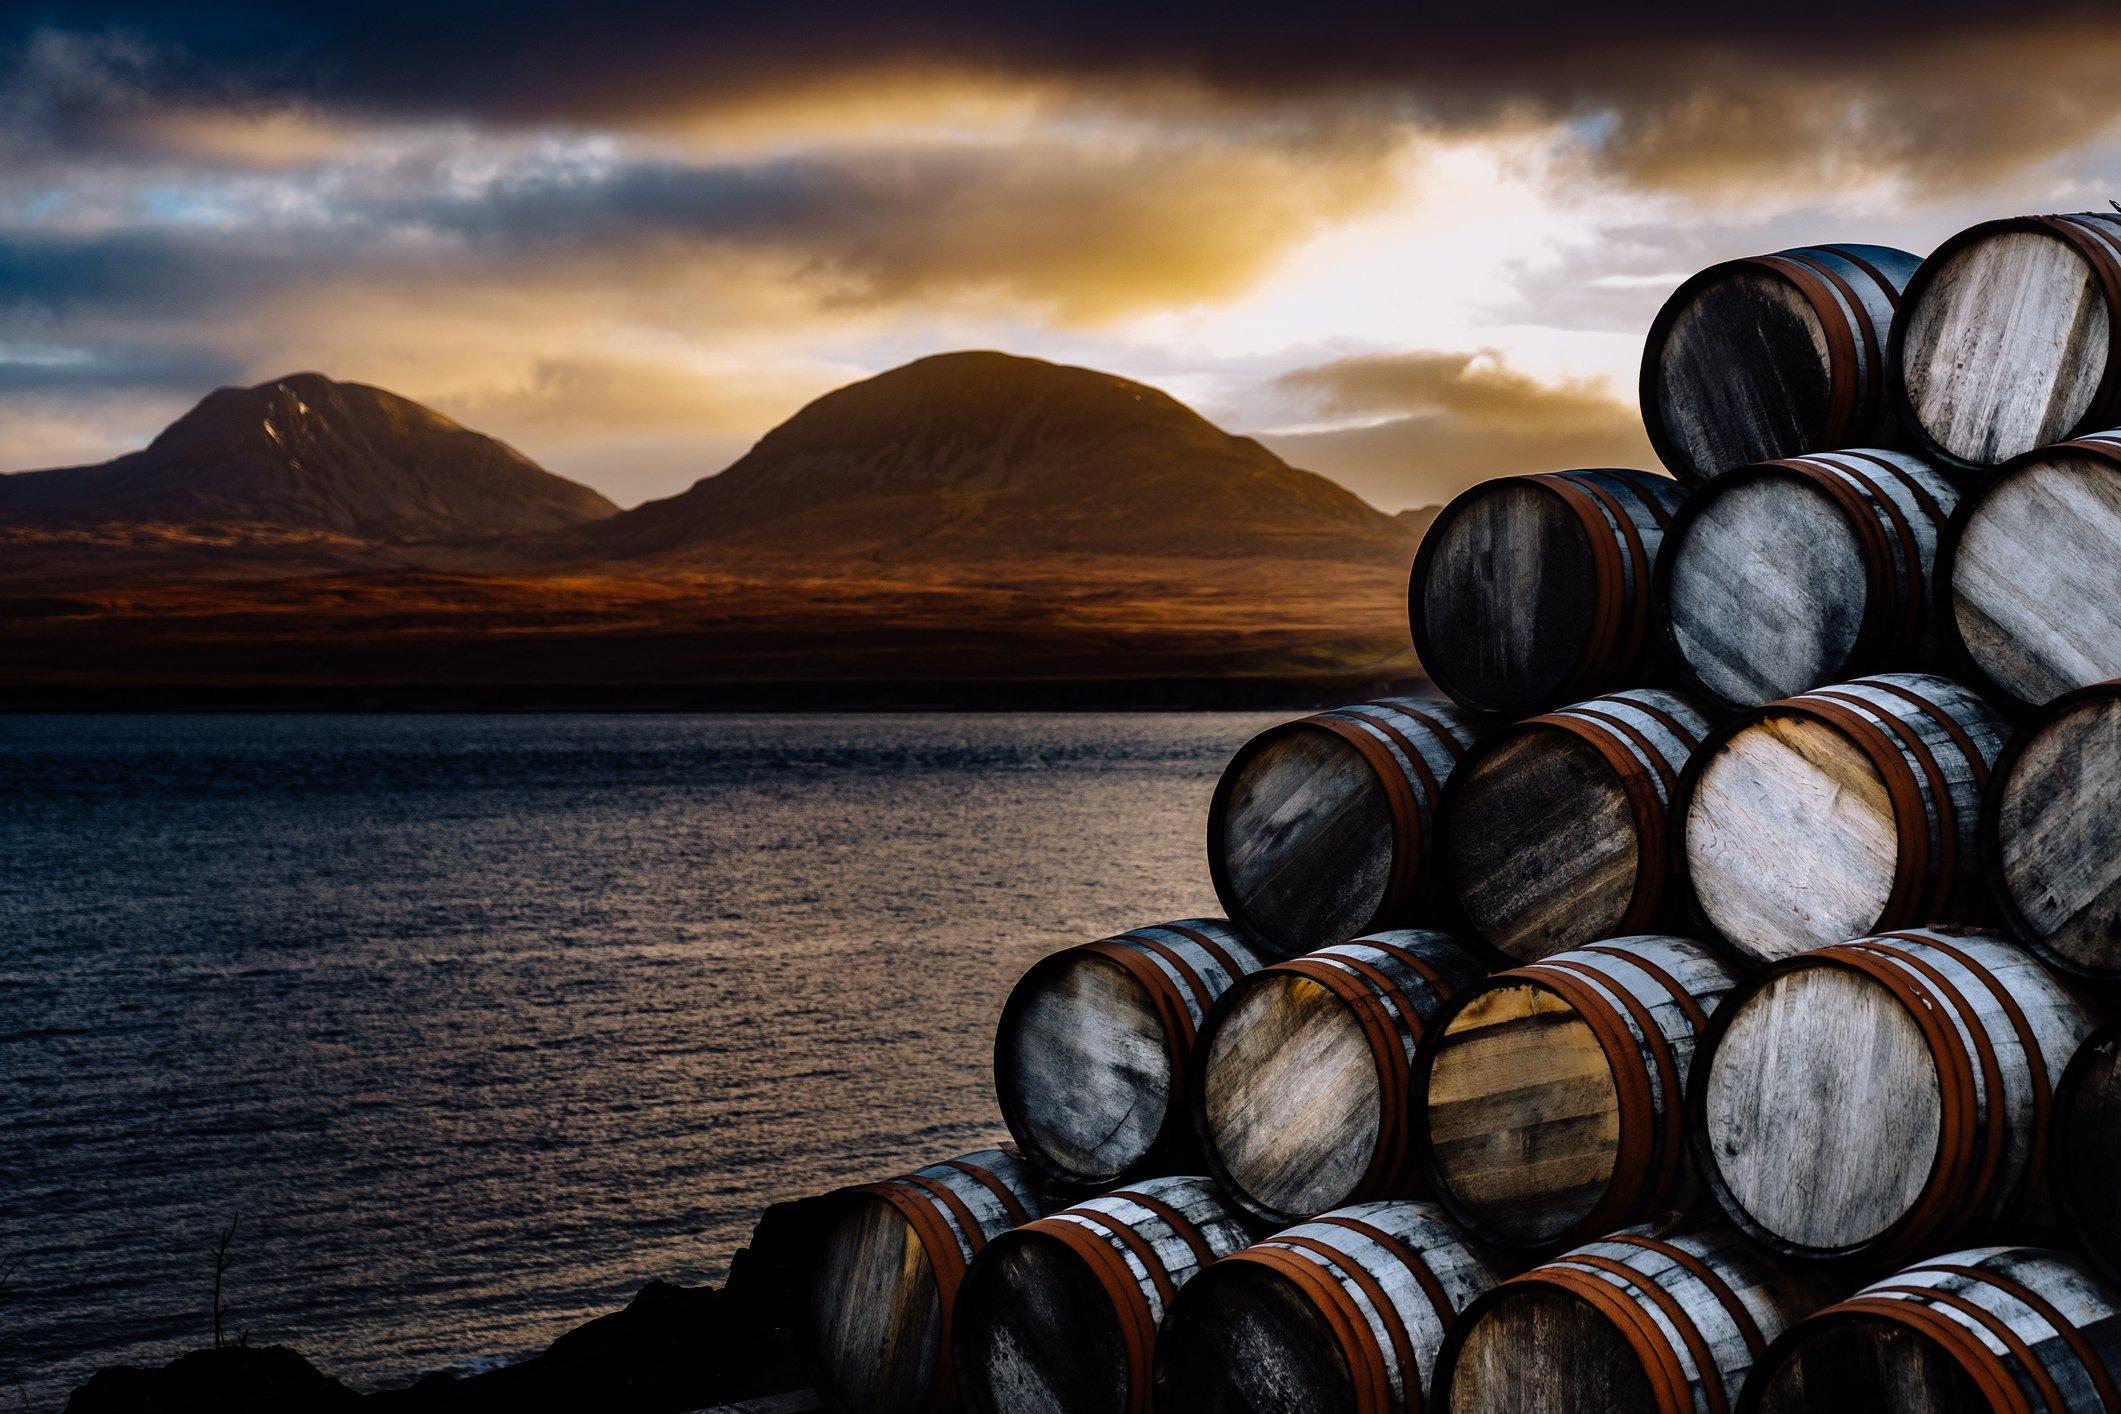 Scotch Whisky - what is scotch whisky? The Pot Still